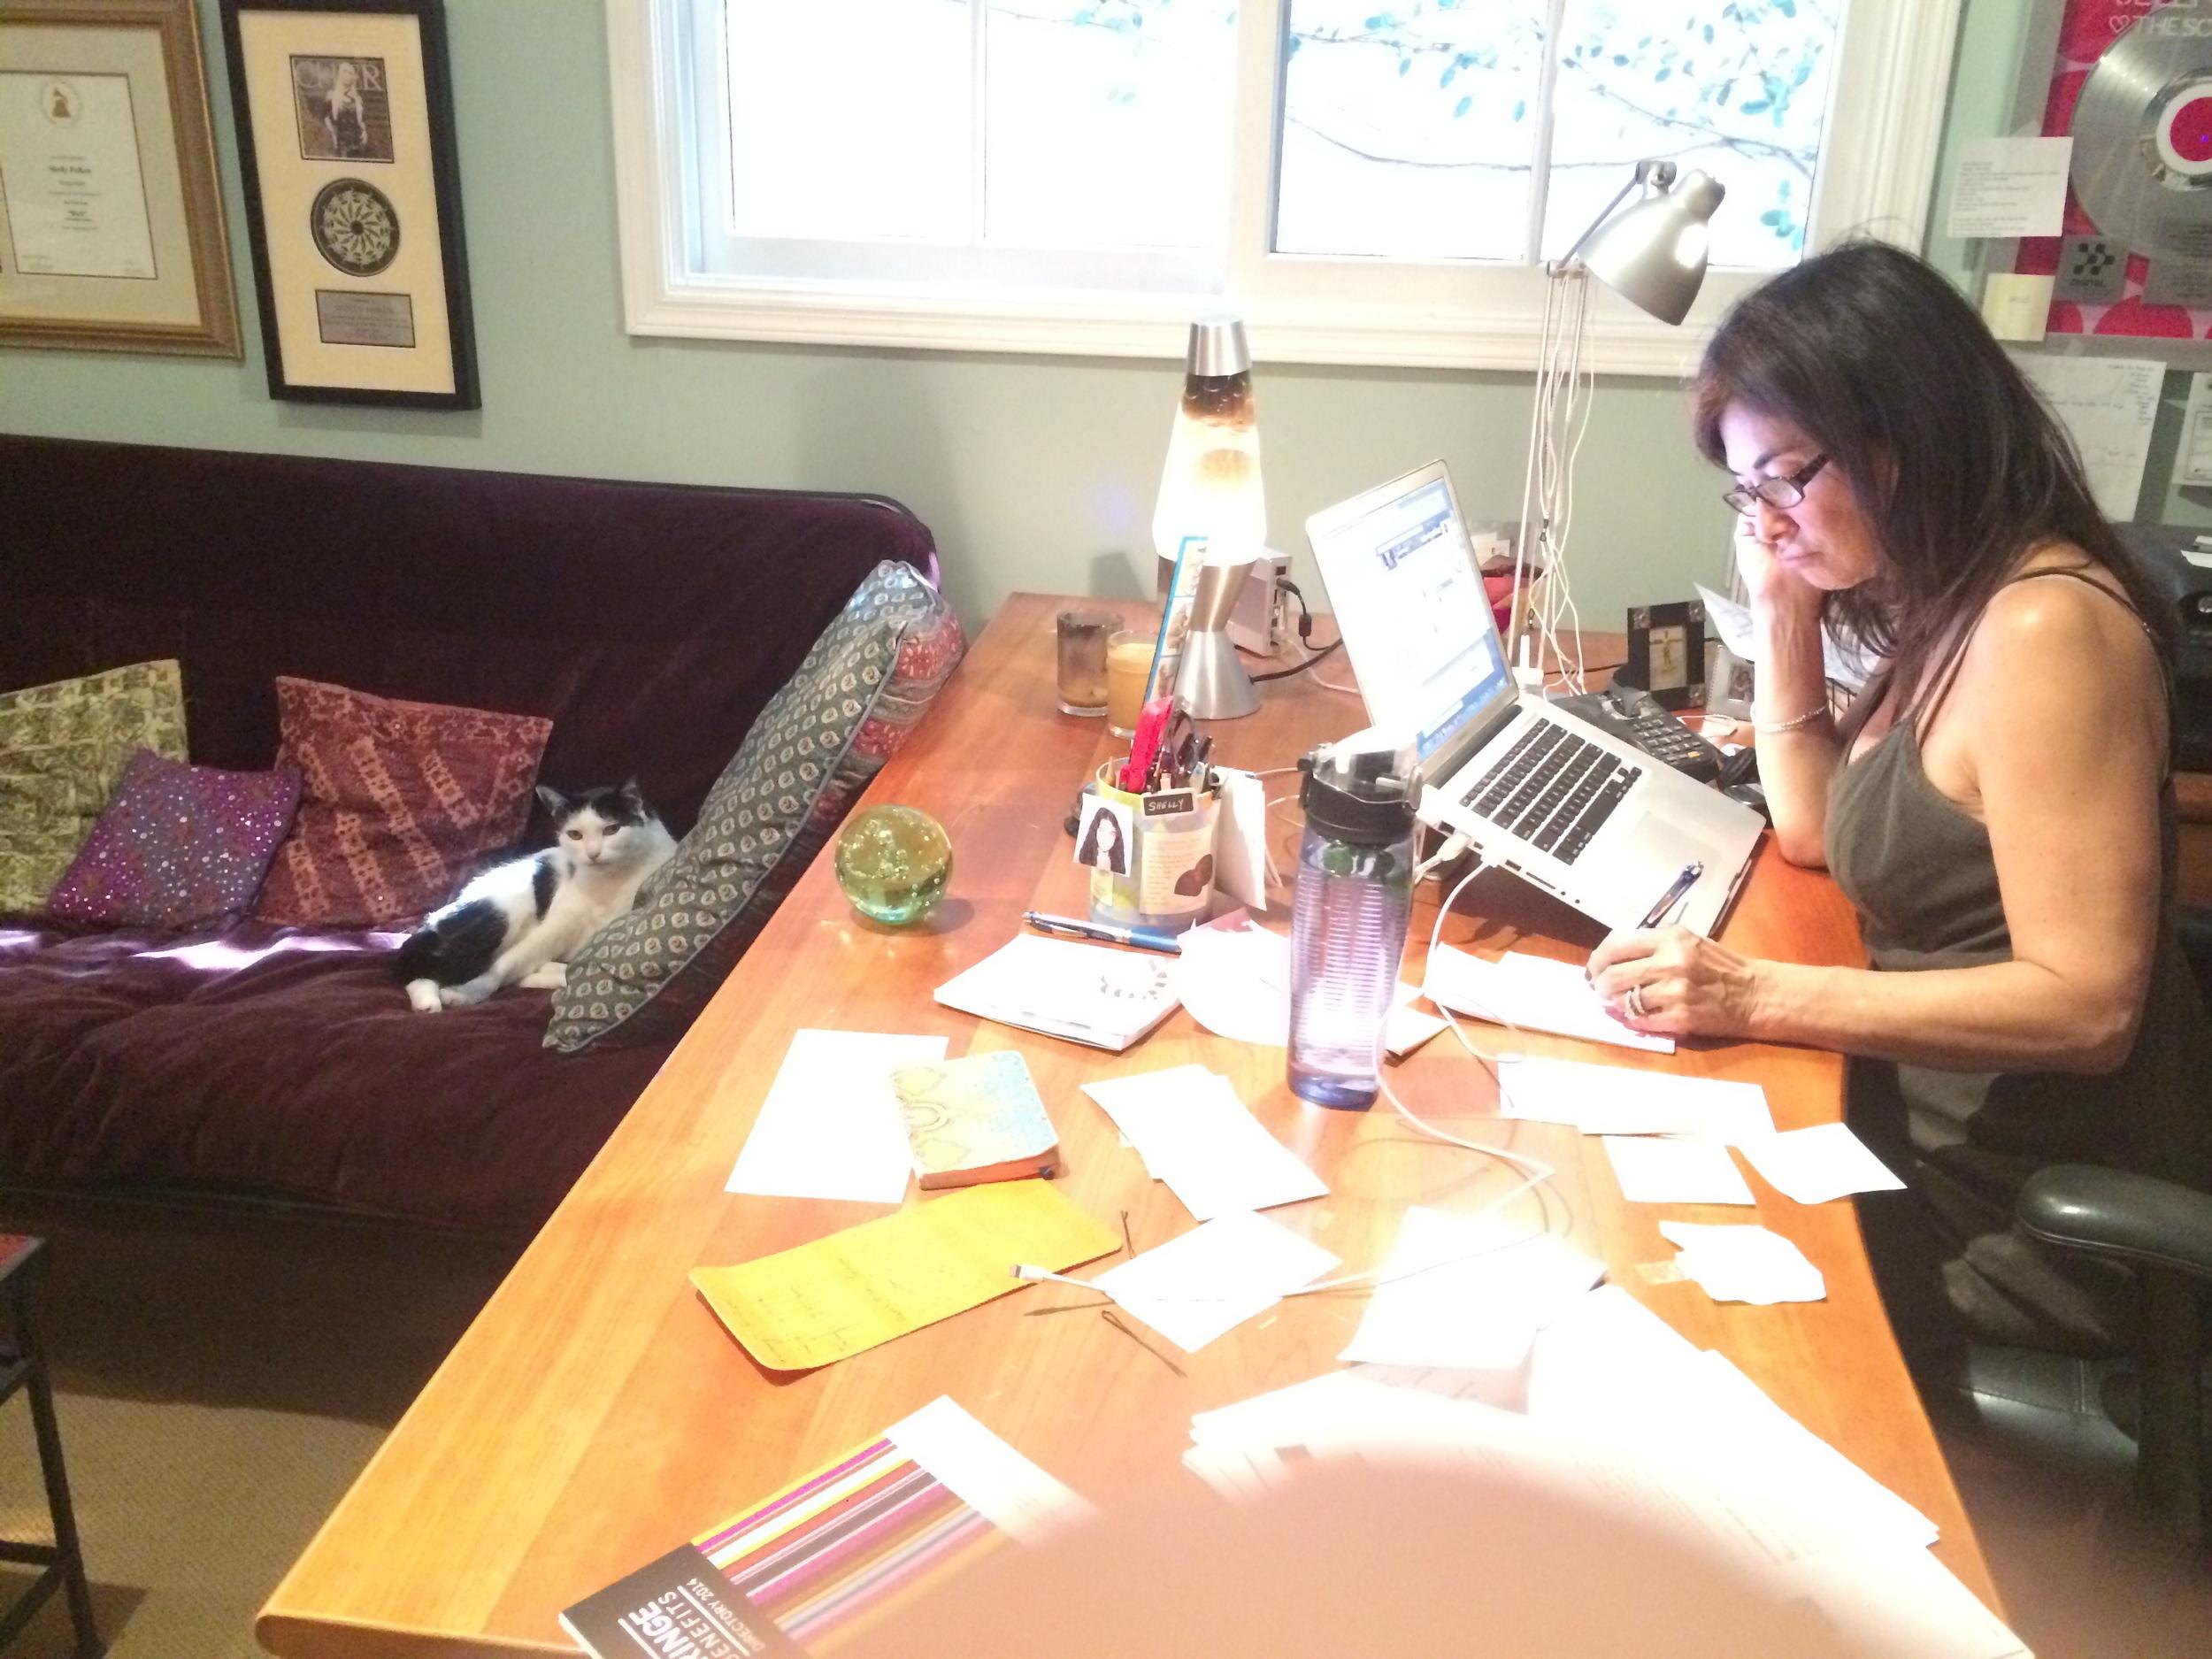 Shelly Peiken writing